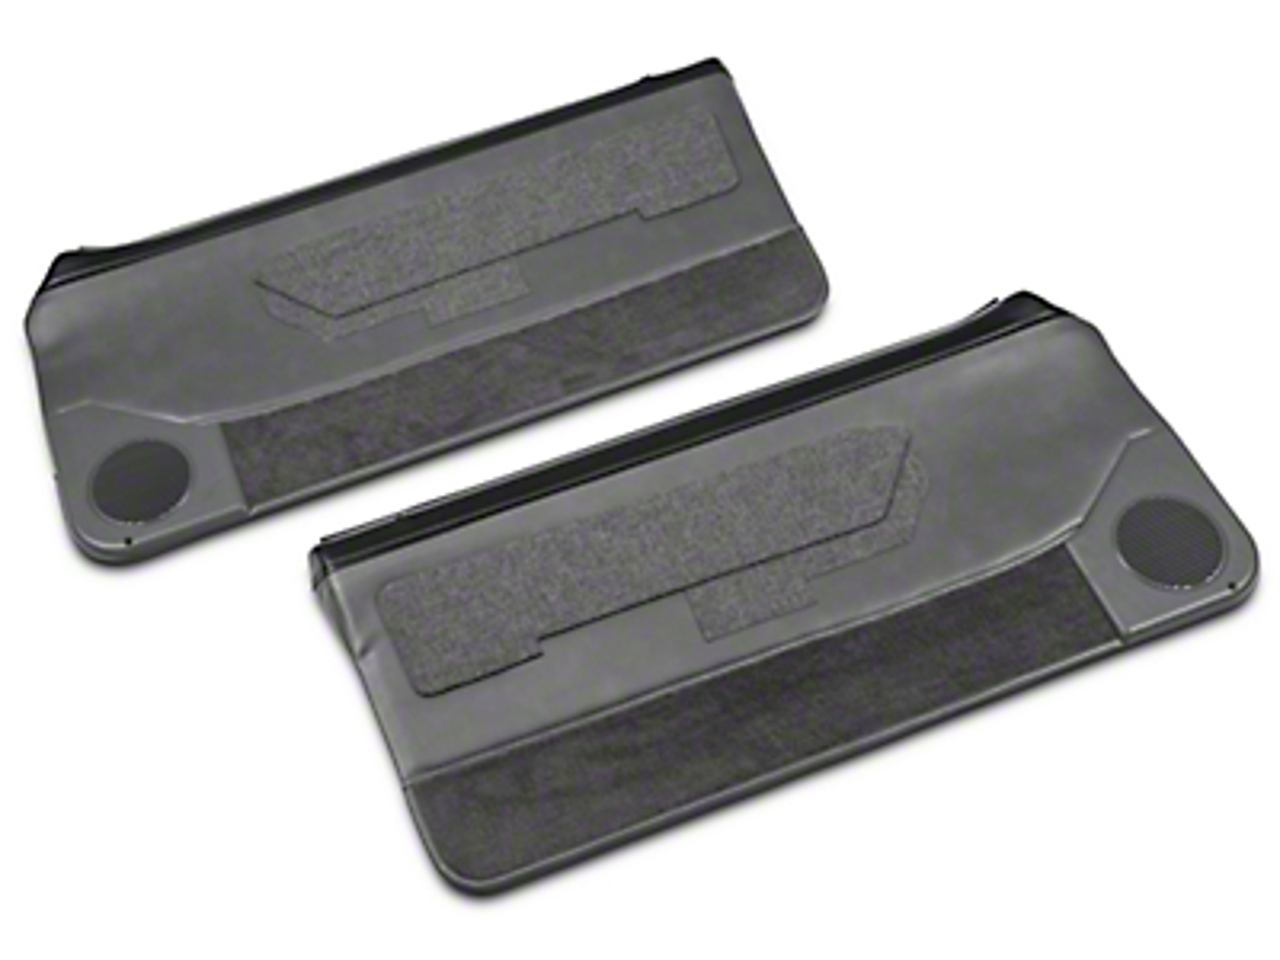 OPR Convertible Door Panel for Power Windows - Smoke Gray (87-93 All)